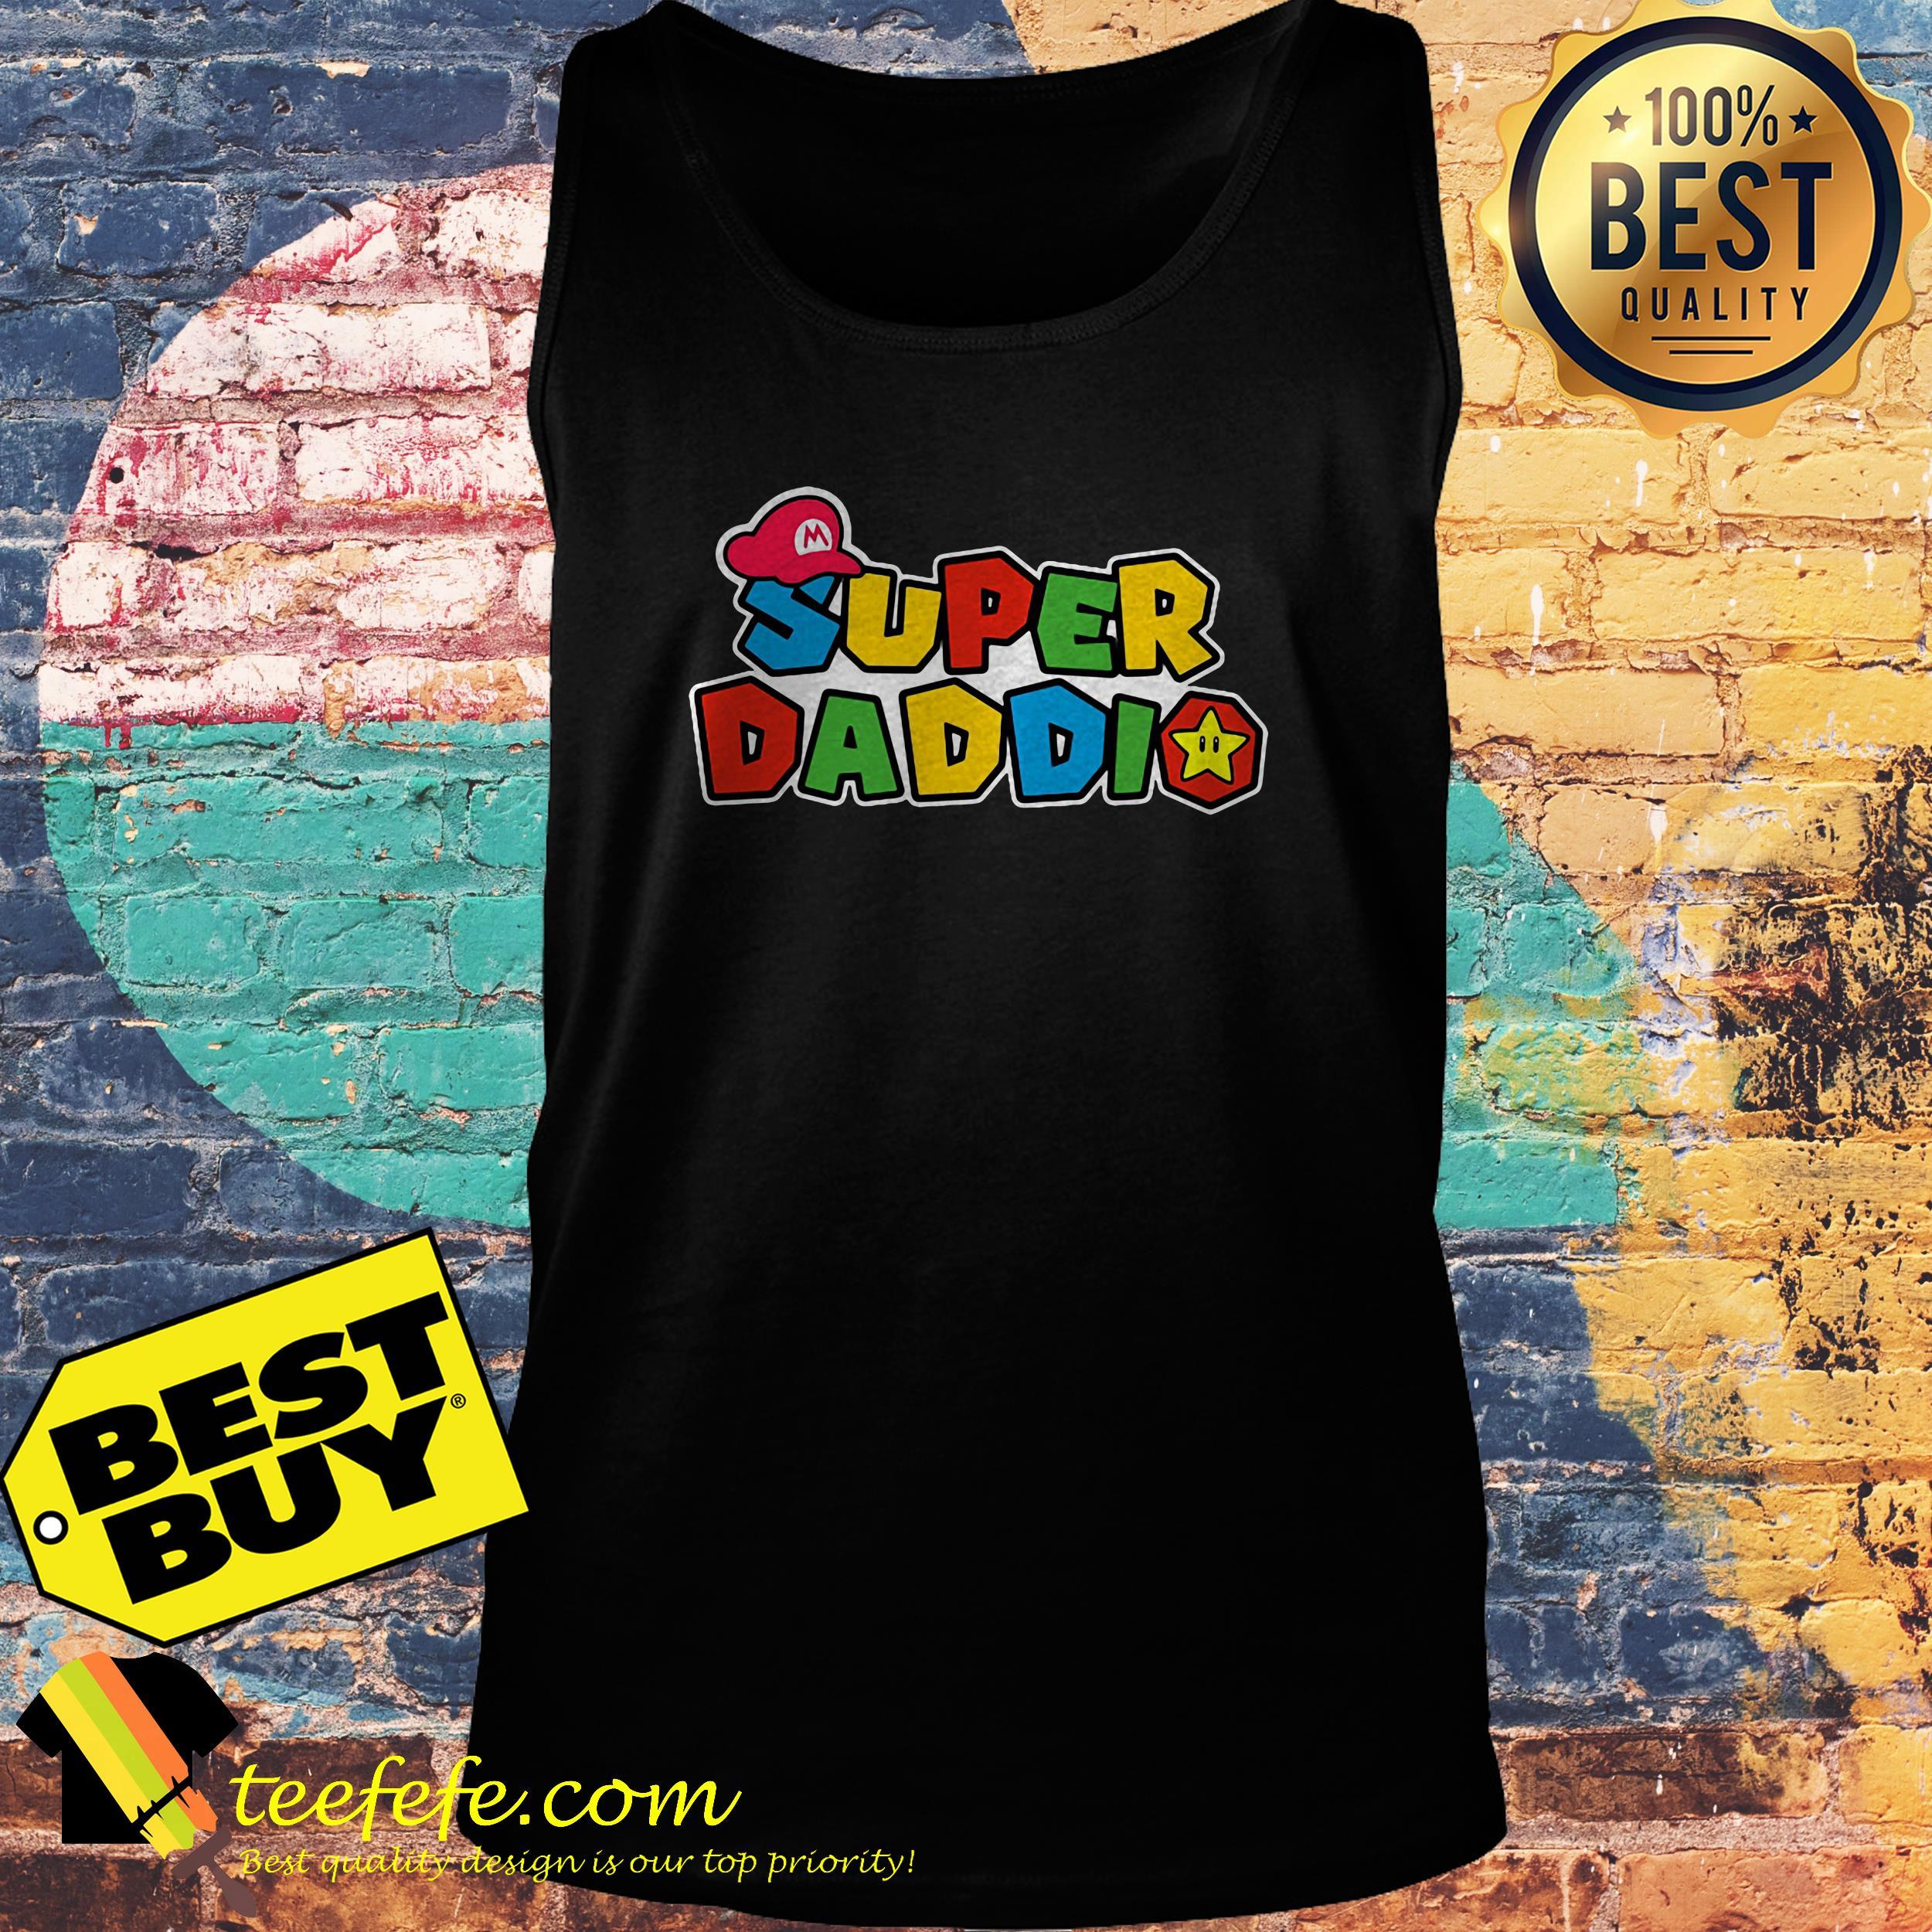 Super Daddio Super Mario tank top